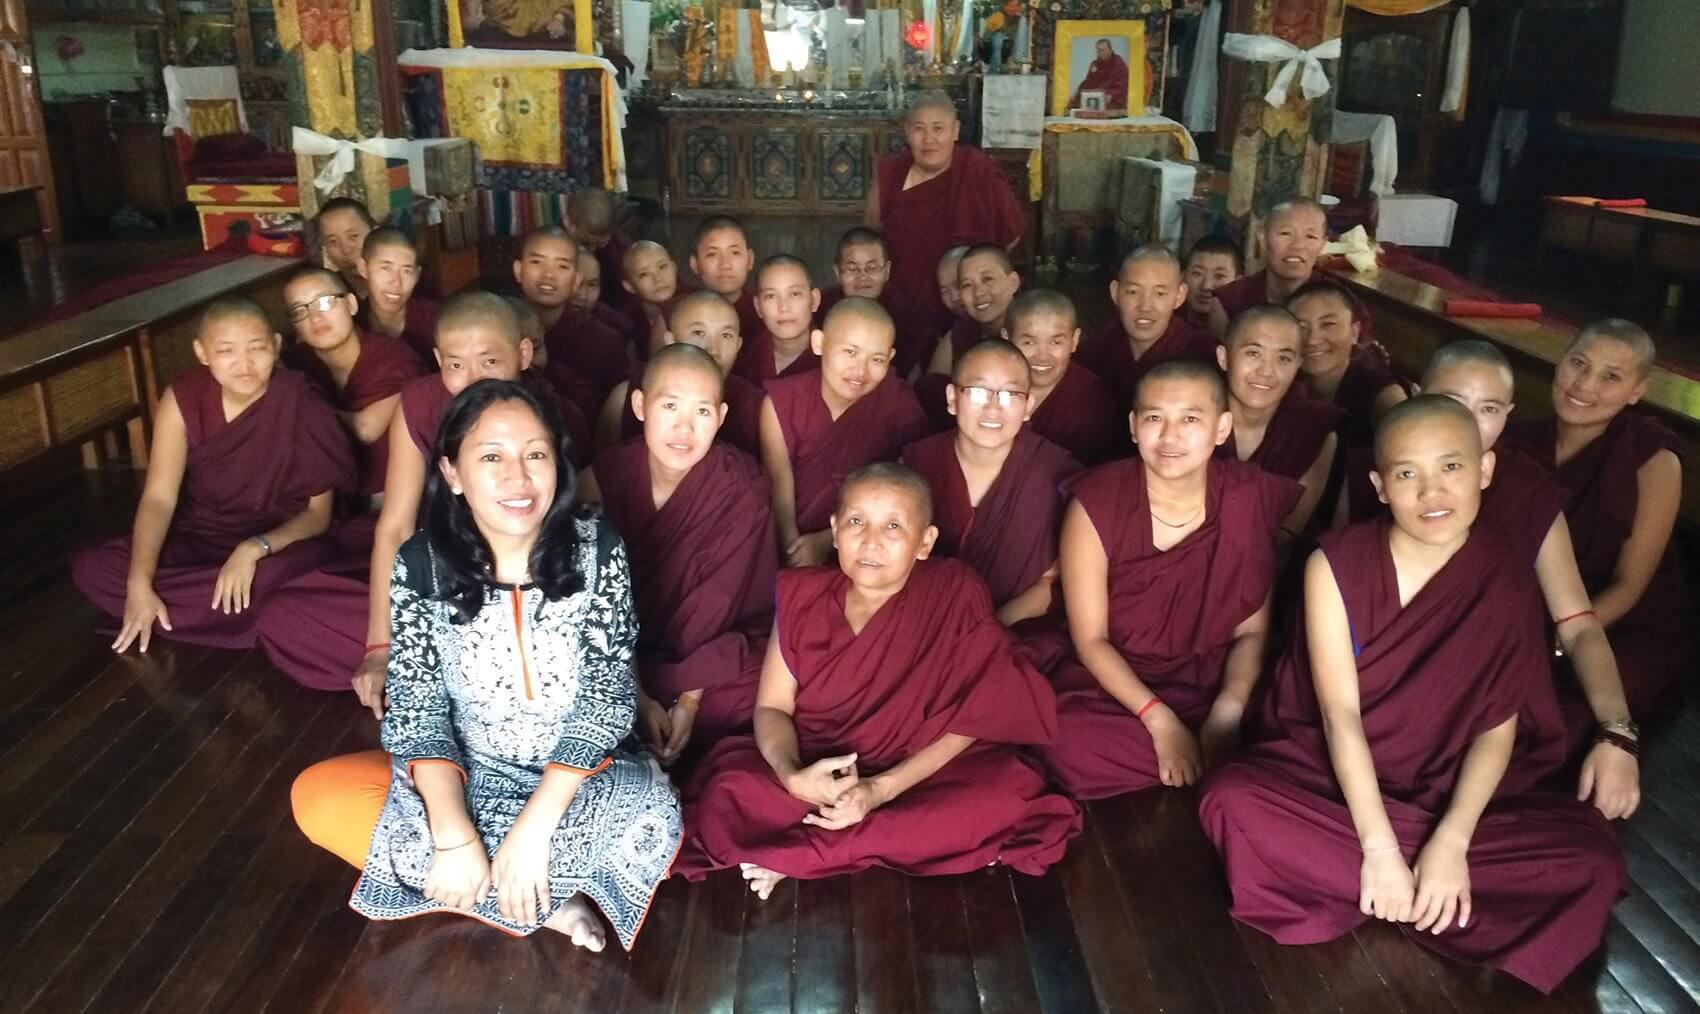 Banu visits a nunnery in Nepal's capital, Kathmandu.